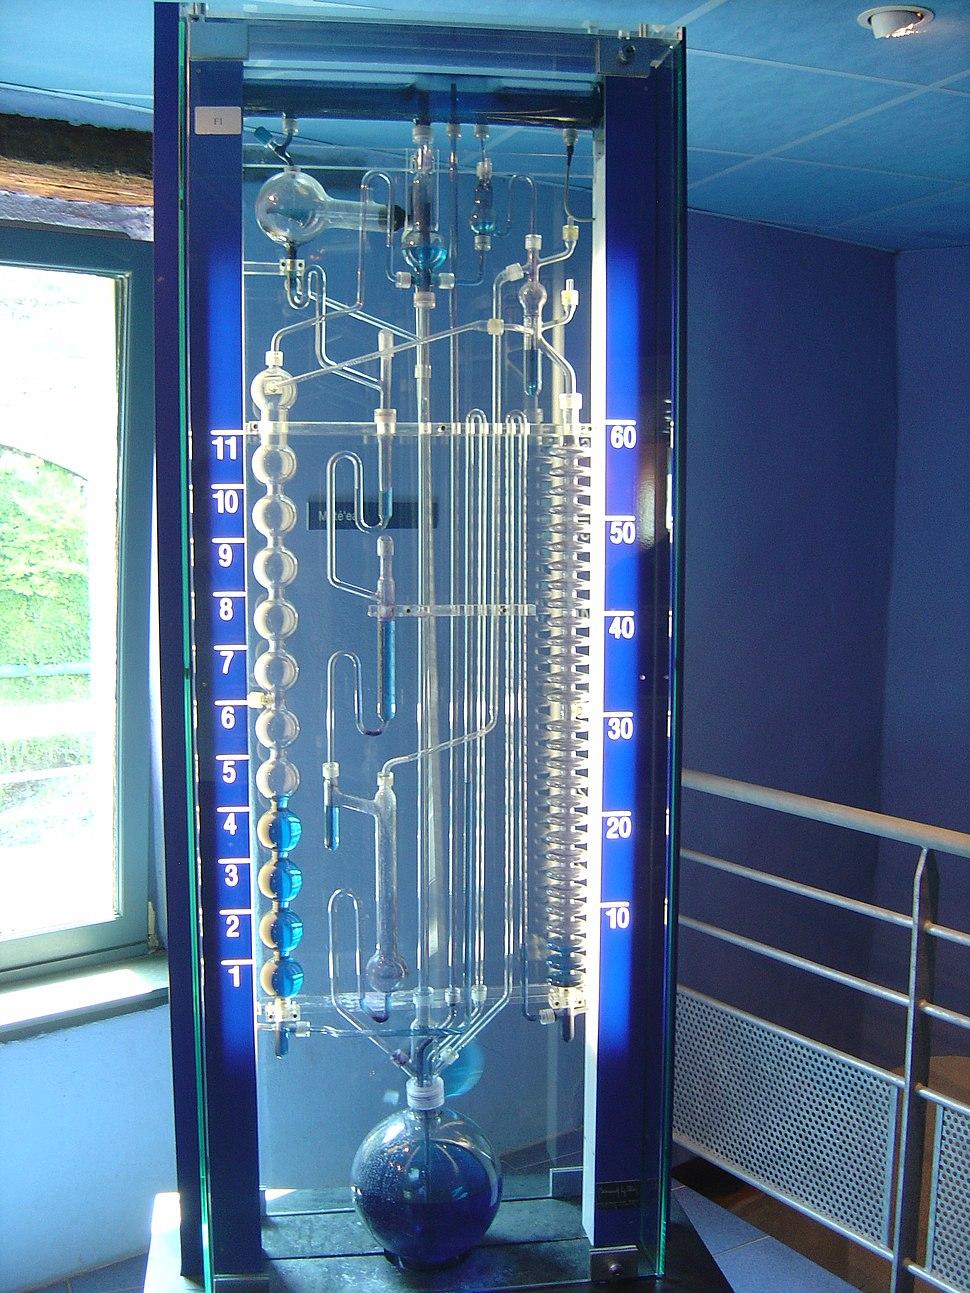 Modern water clock